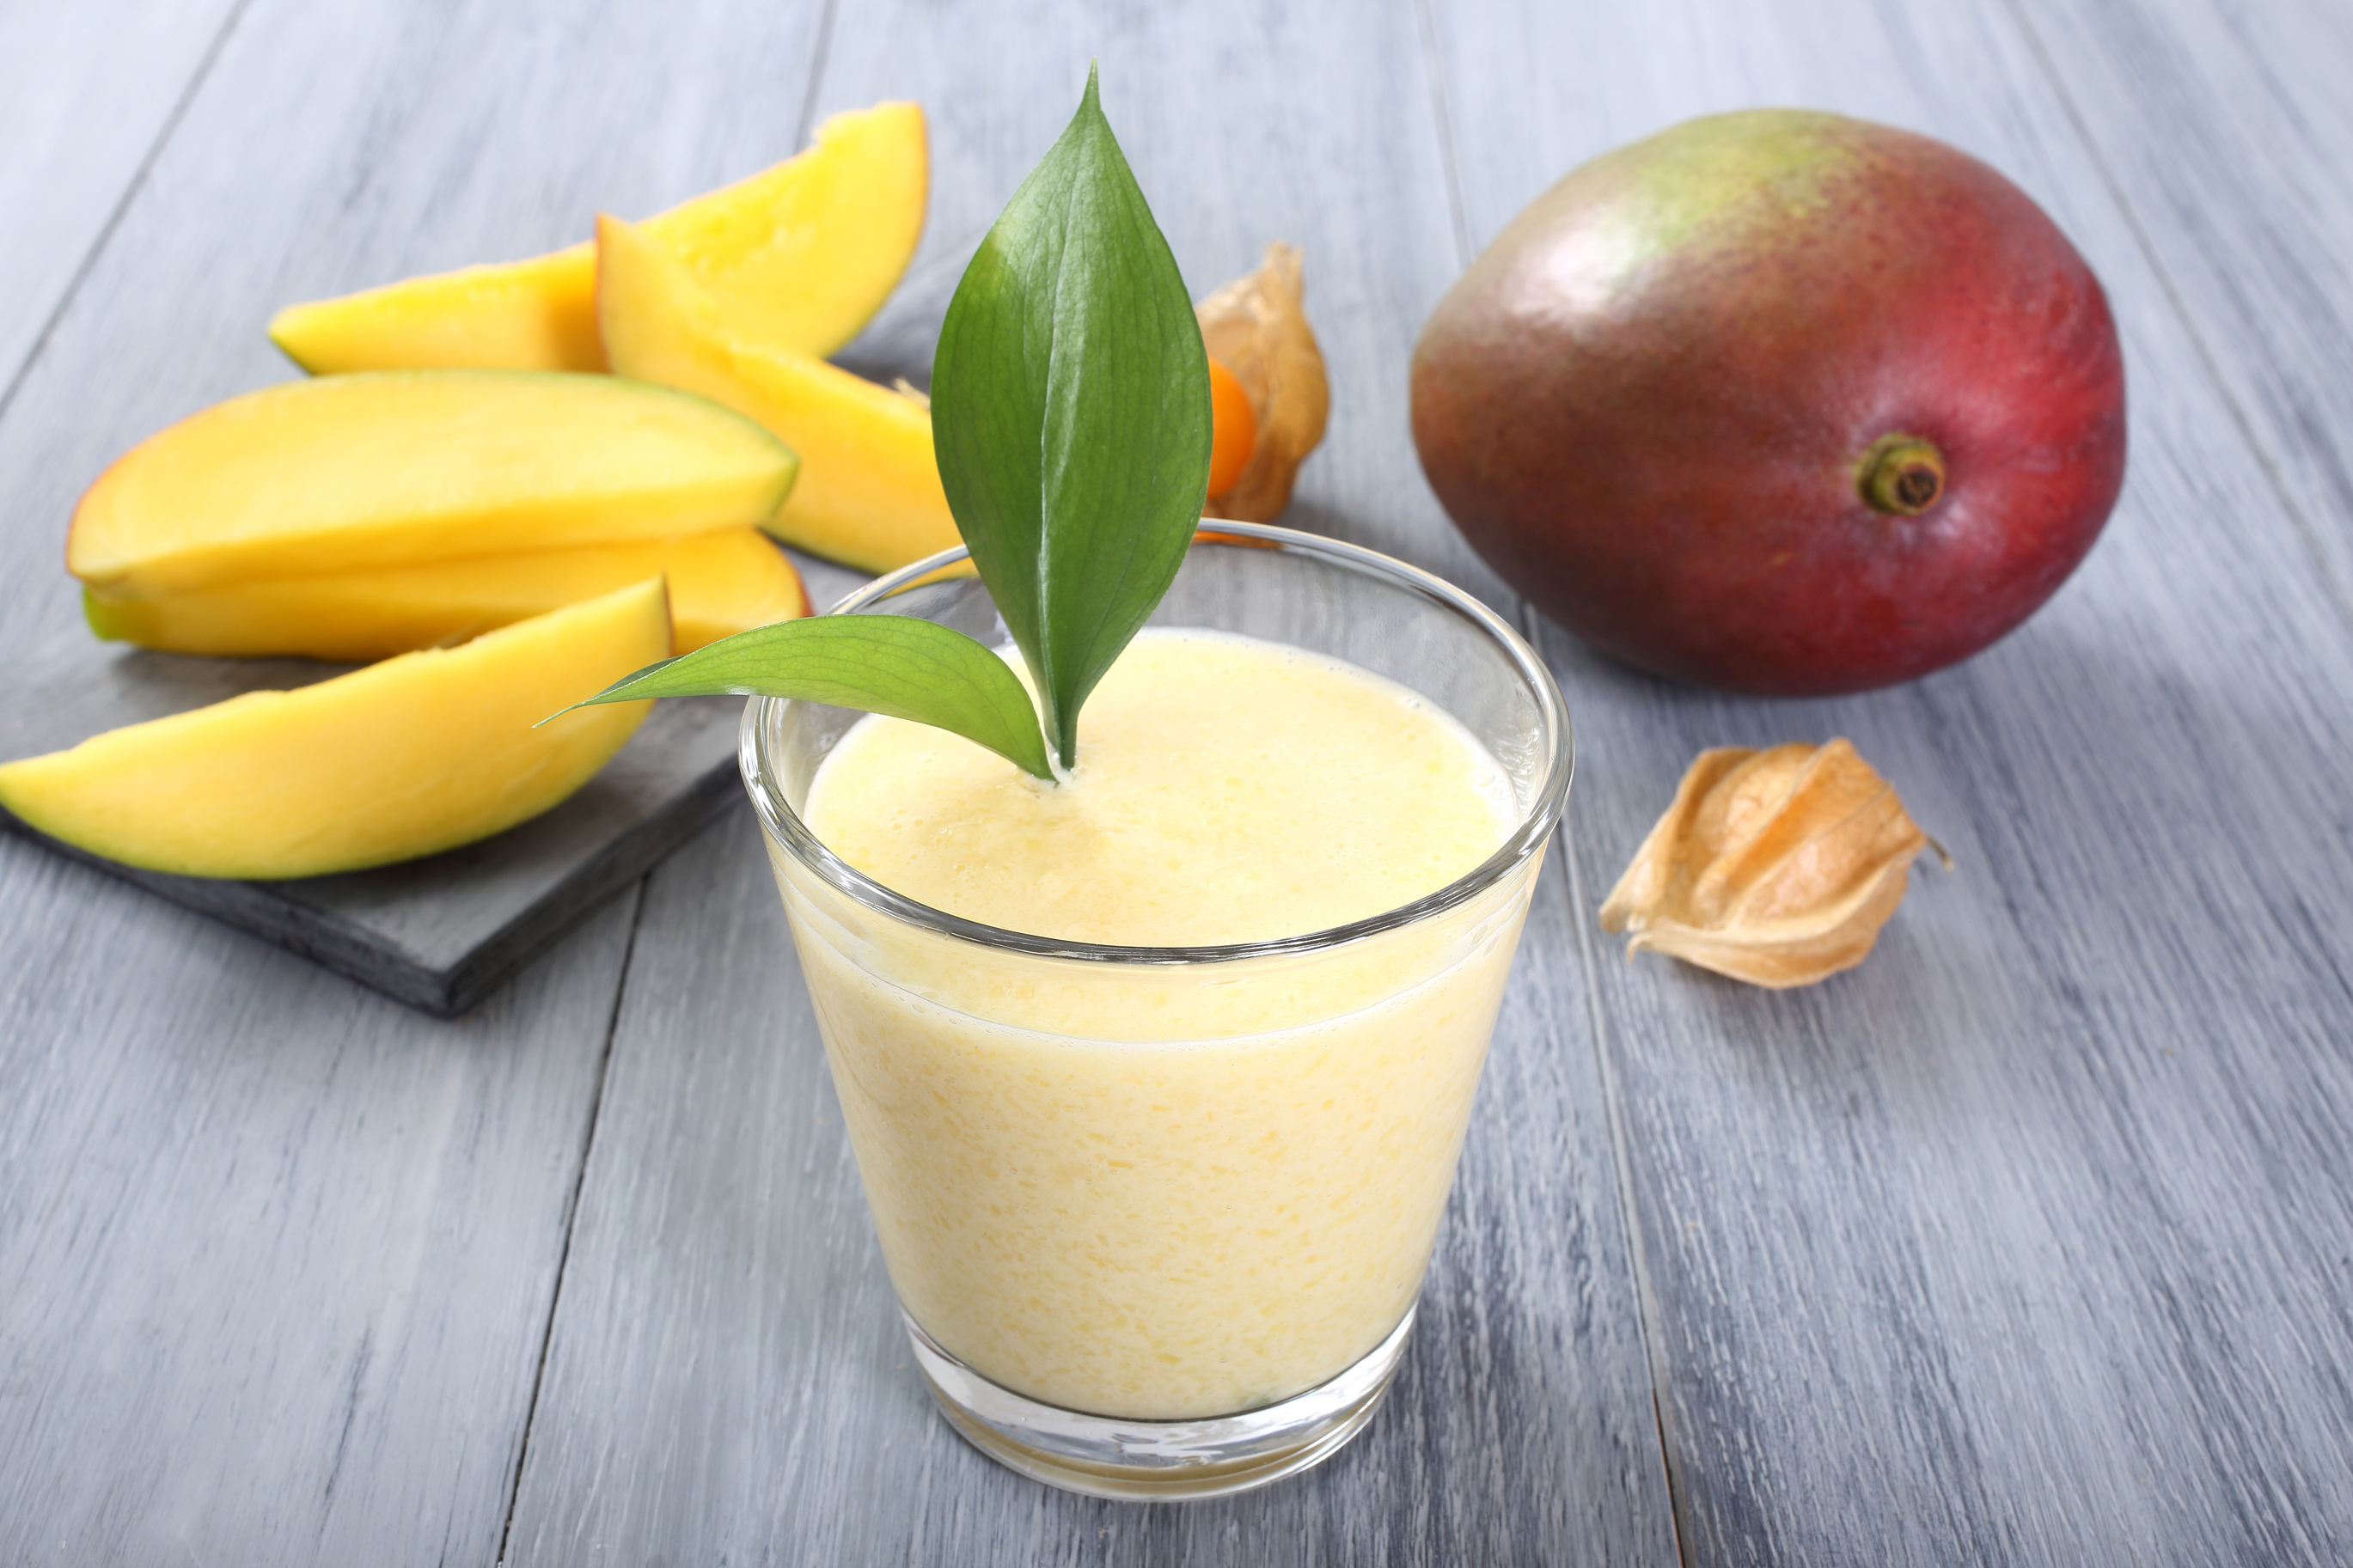 mango-smoothie-38556469